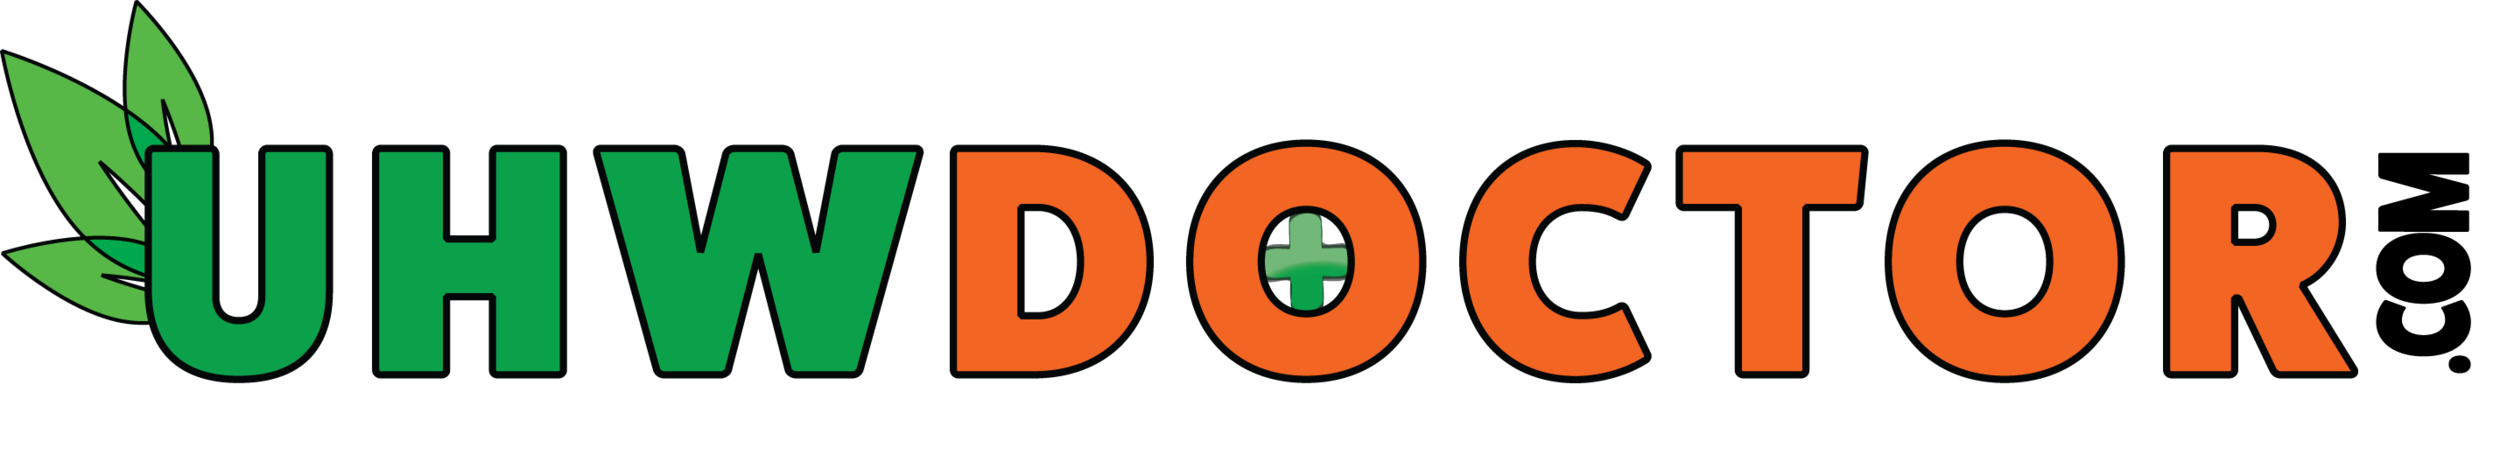 UHW Doctor logo final.png